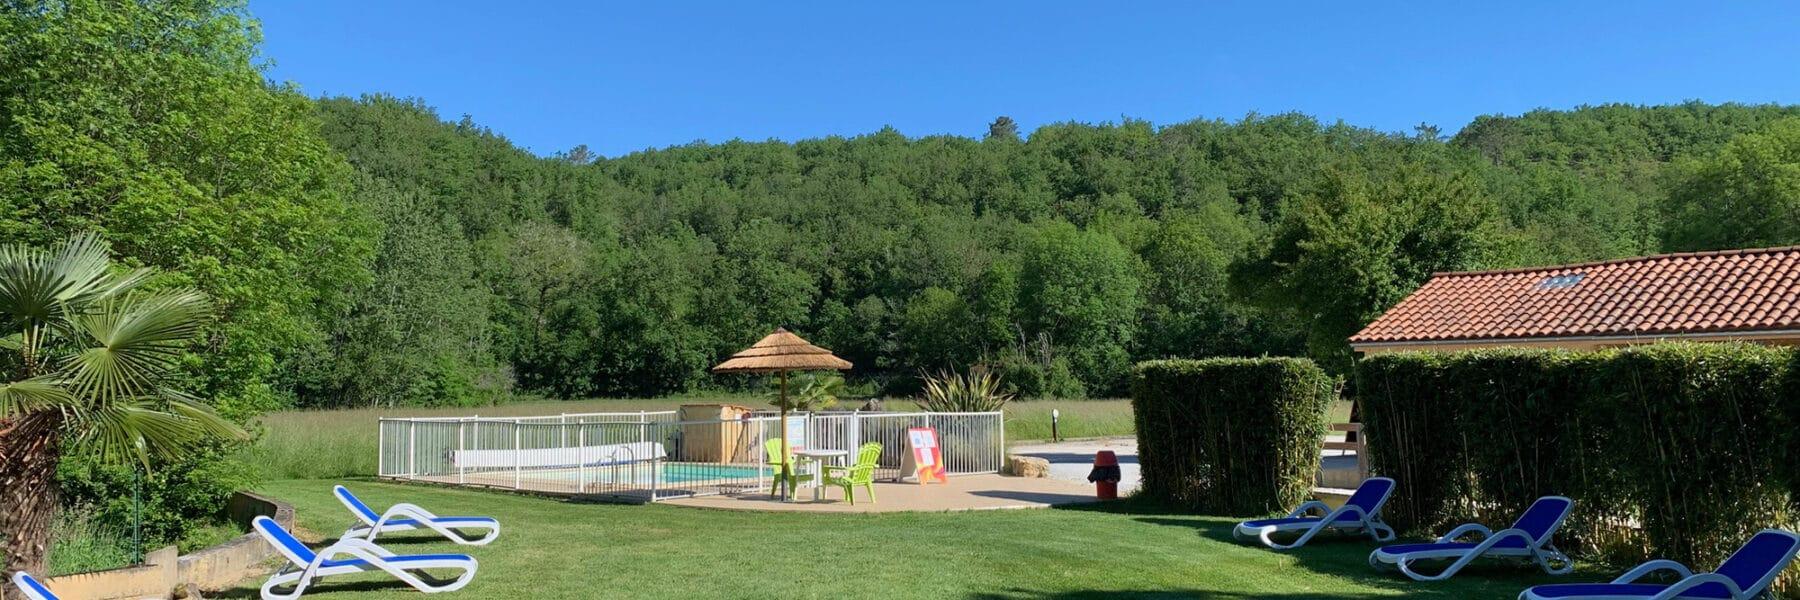 Les bassins chauffés du camping en Dordogne